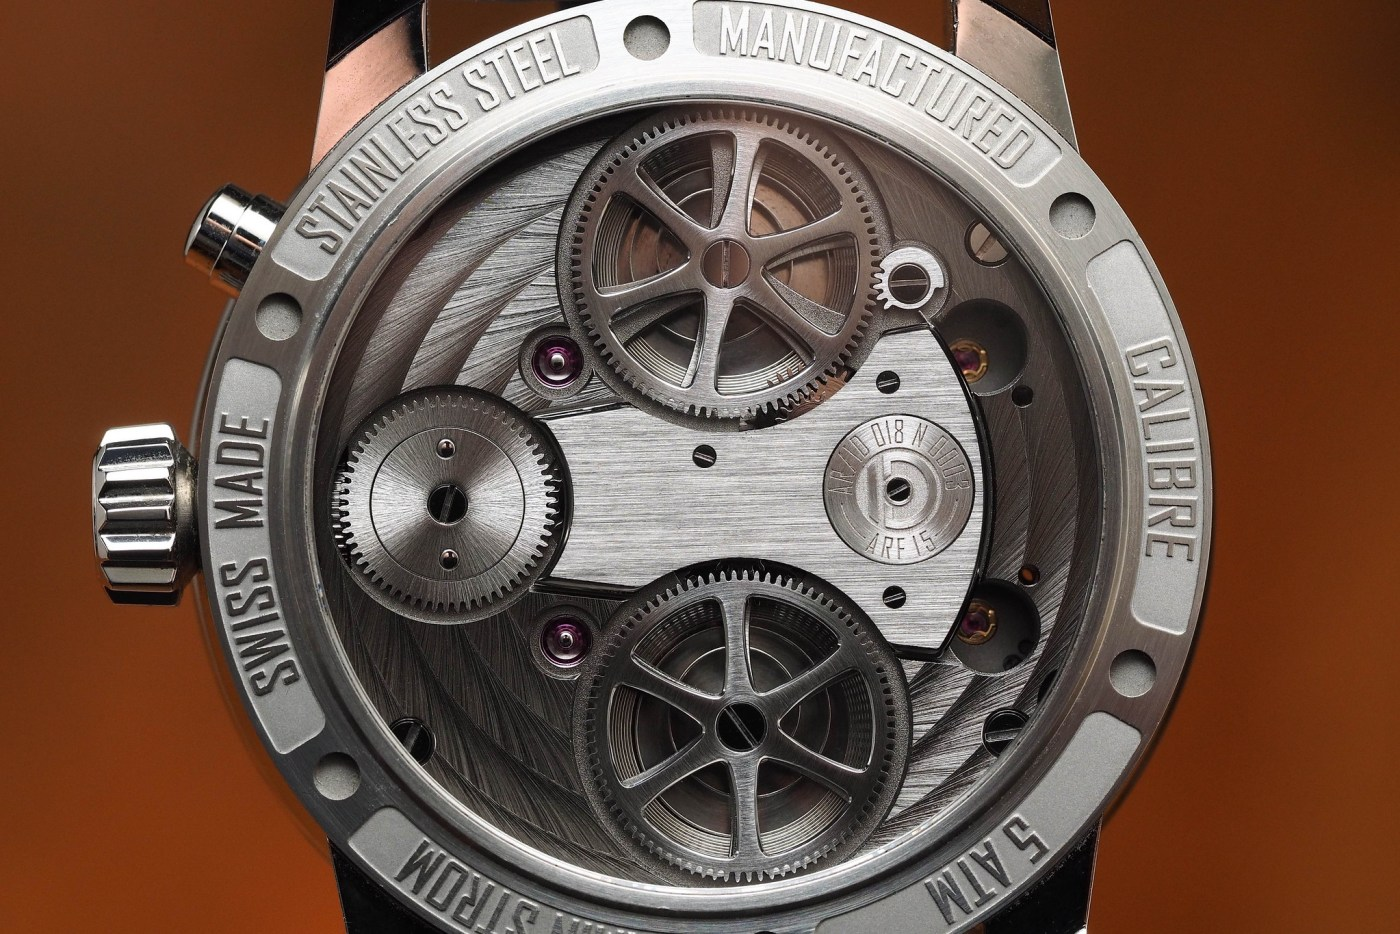 Armin Strom Mirrored Force Resonance stainless steel caseback